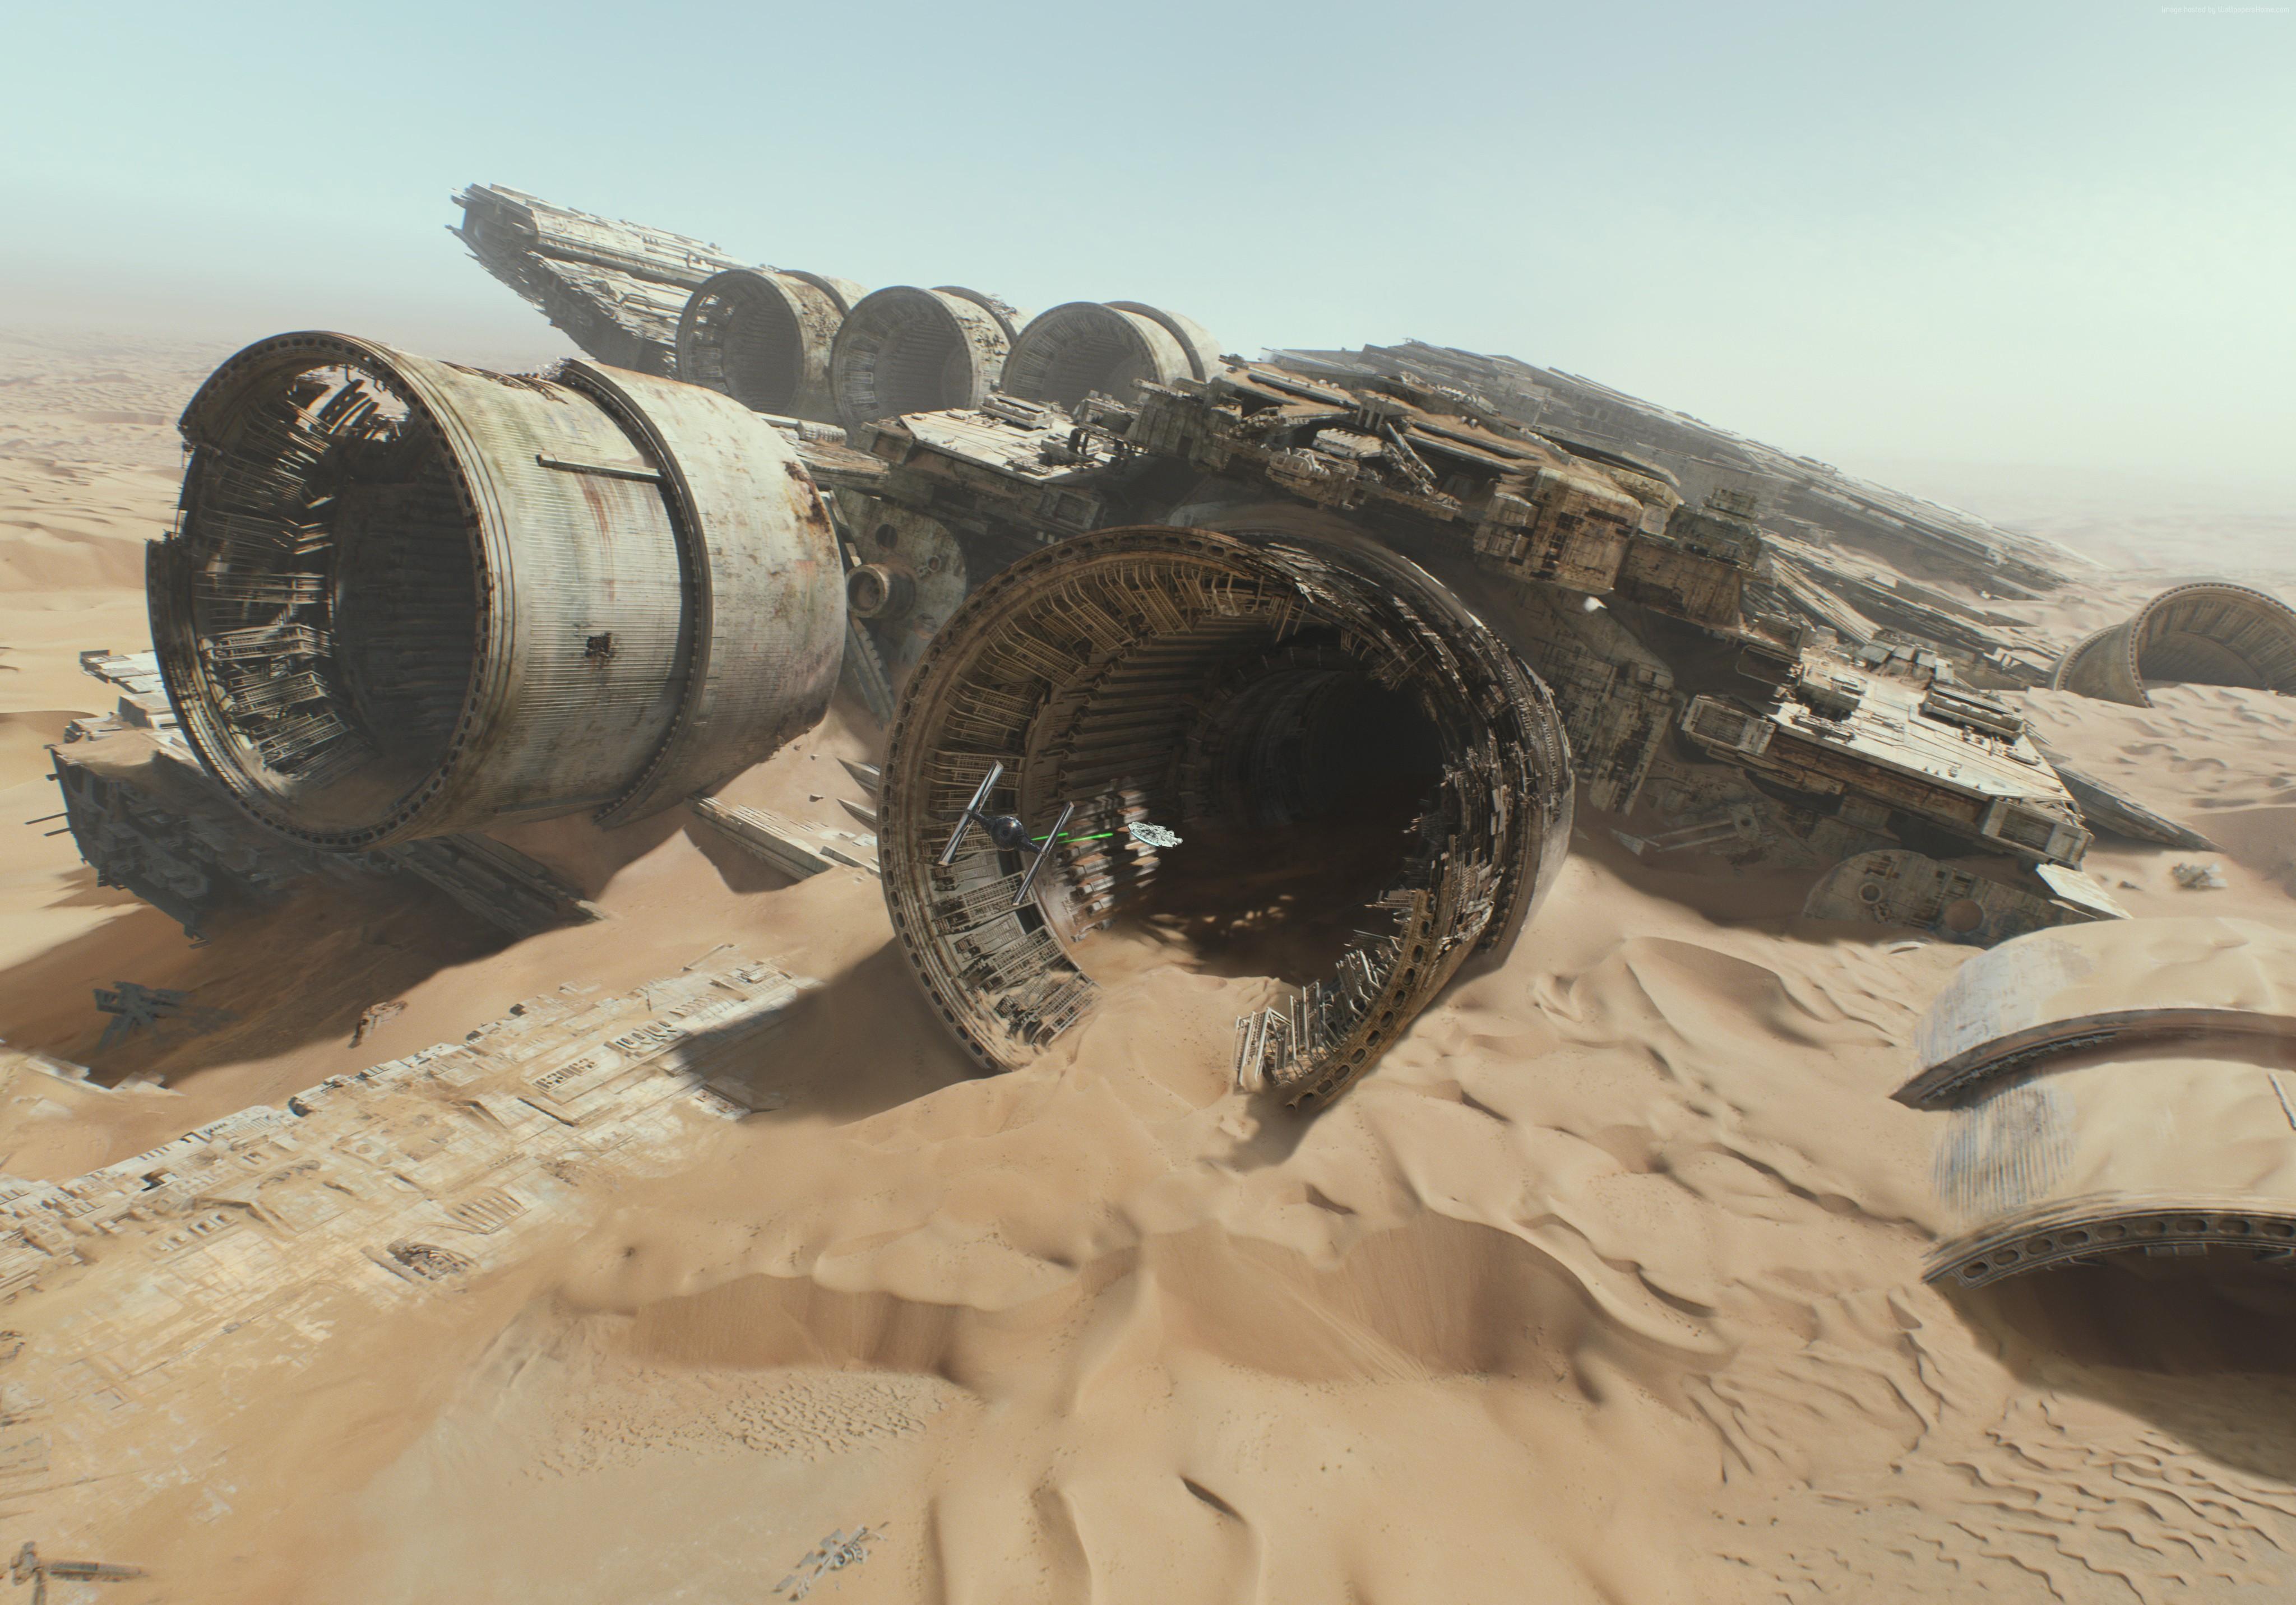 General 4096x2864 Star Wars Star Wars: The Force Awakens Star Destroyer desert crash wreck Star Wars Ships